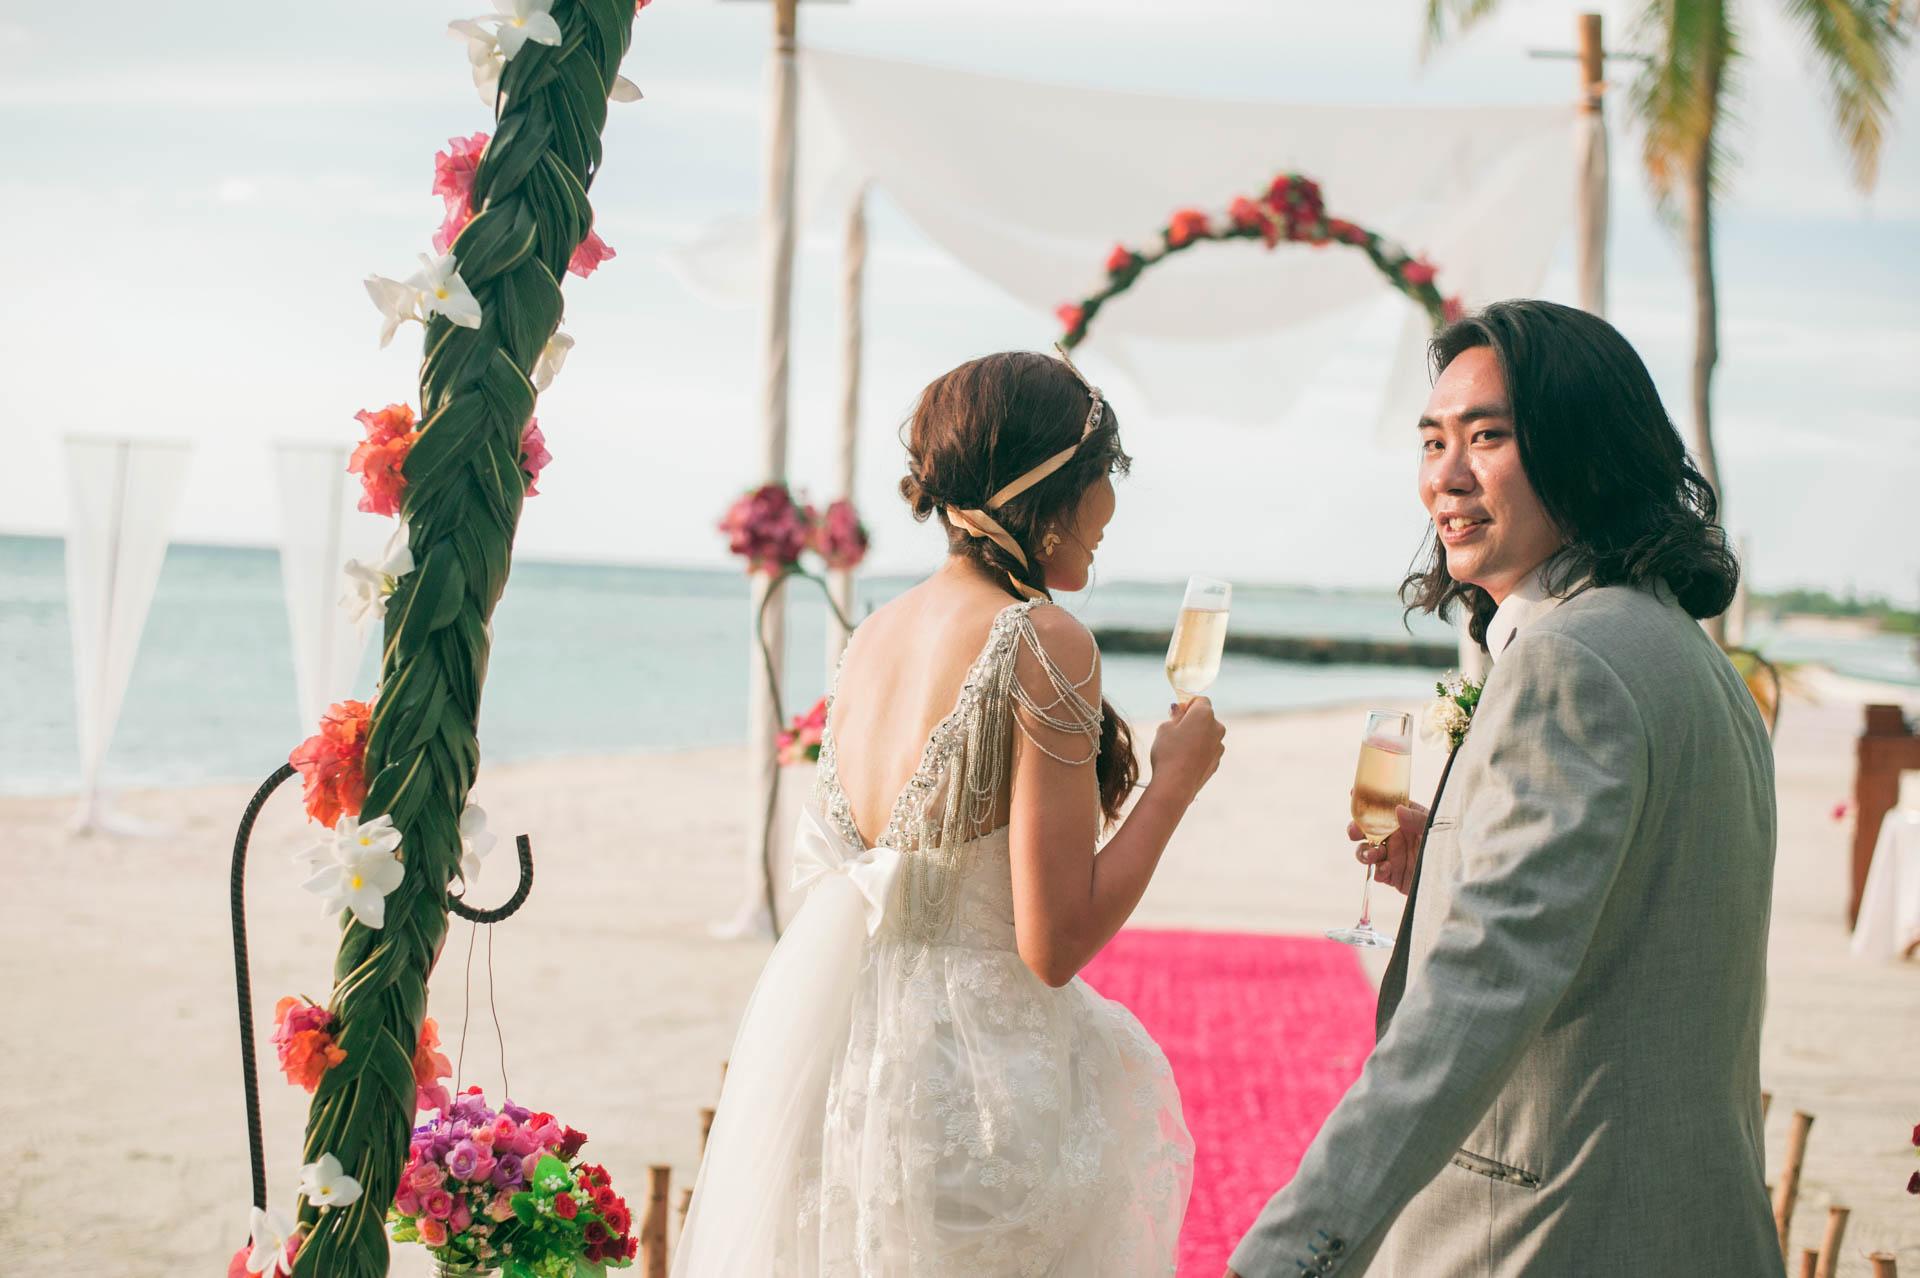 Chih Chao Yu Shan Destination Wedding at Residence Maldives 15